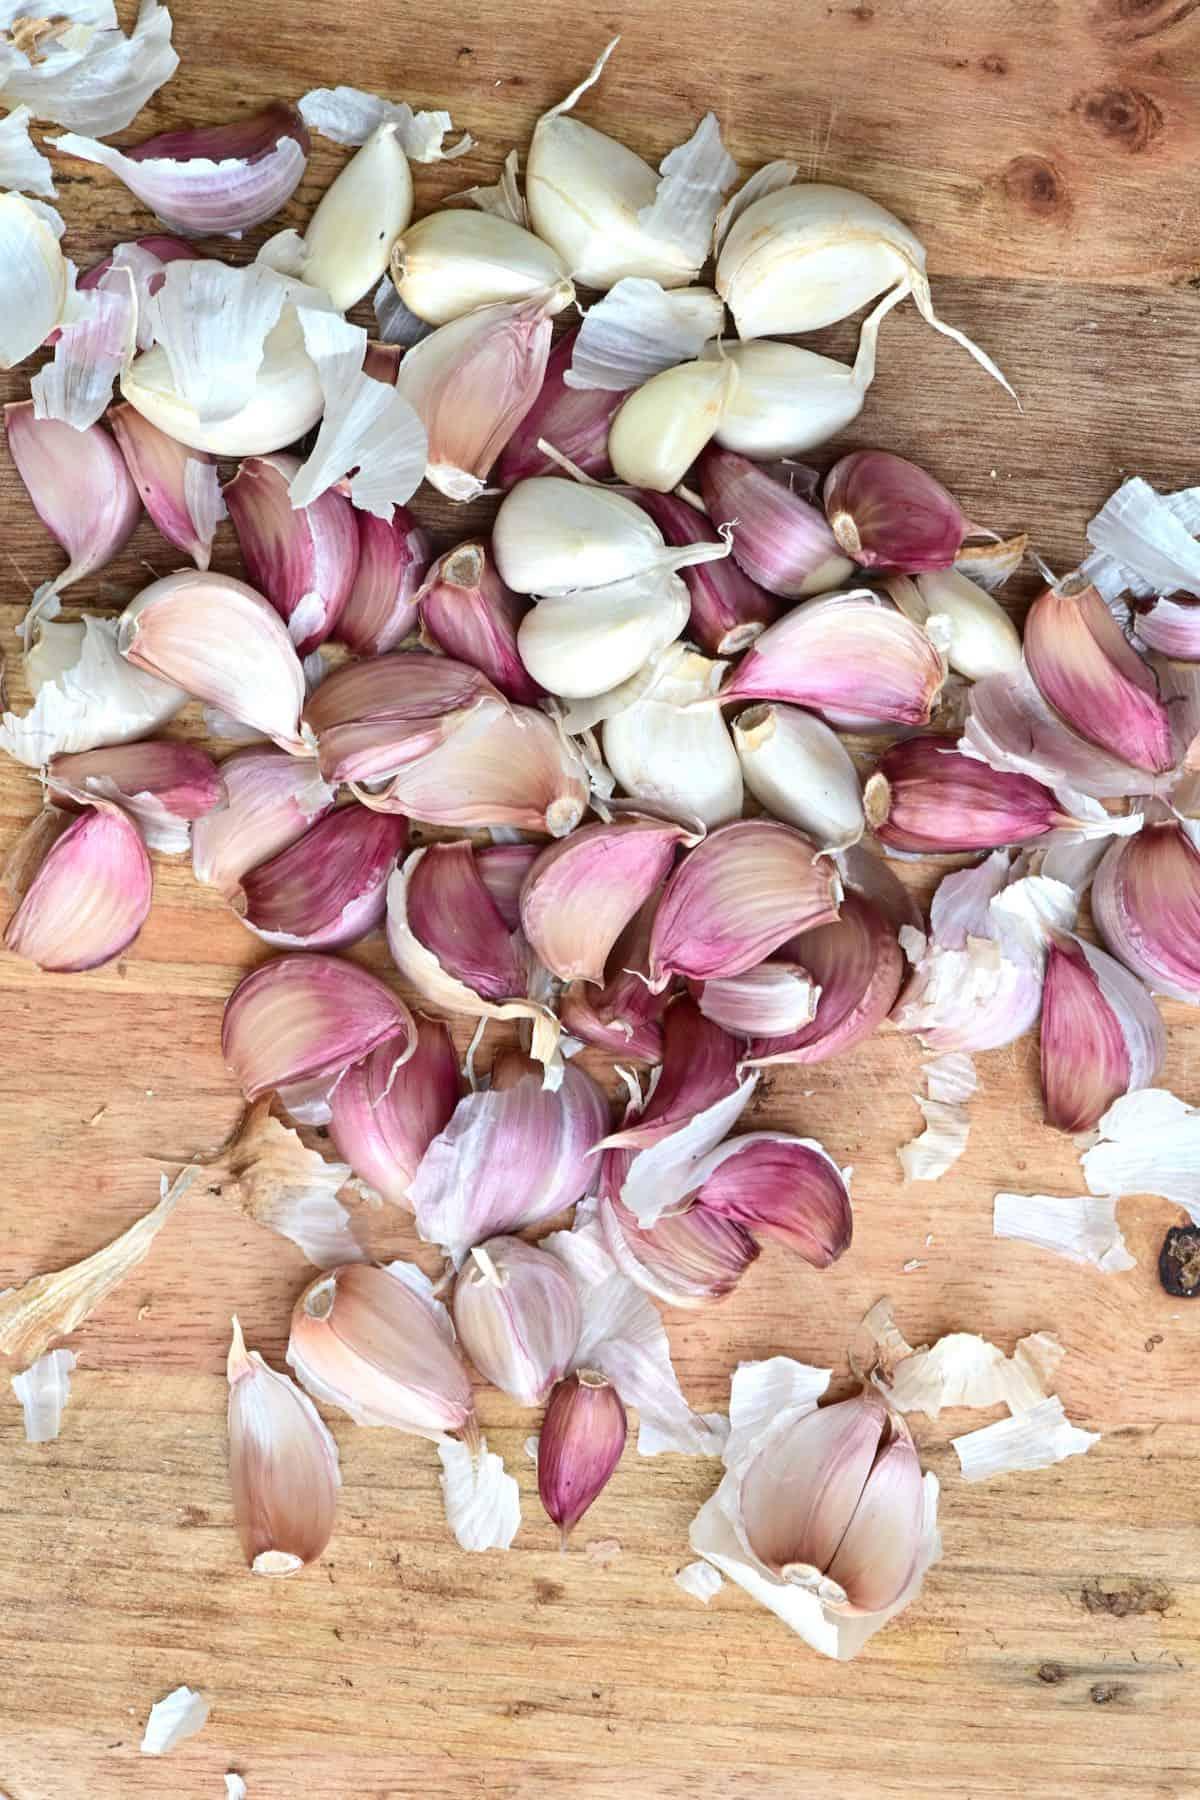 A bunch of peeled garlic cloves